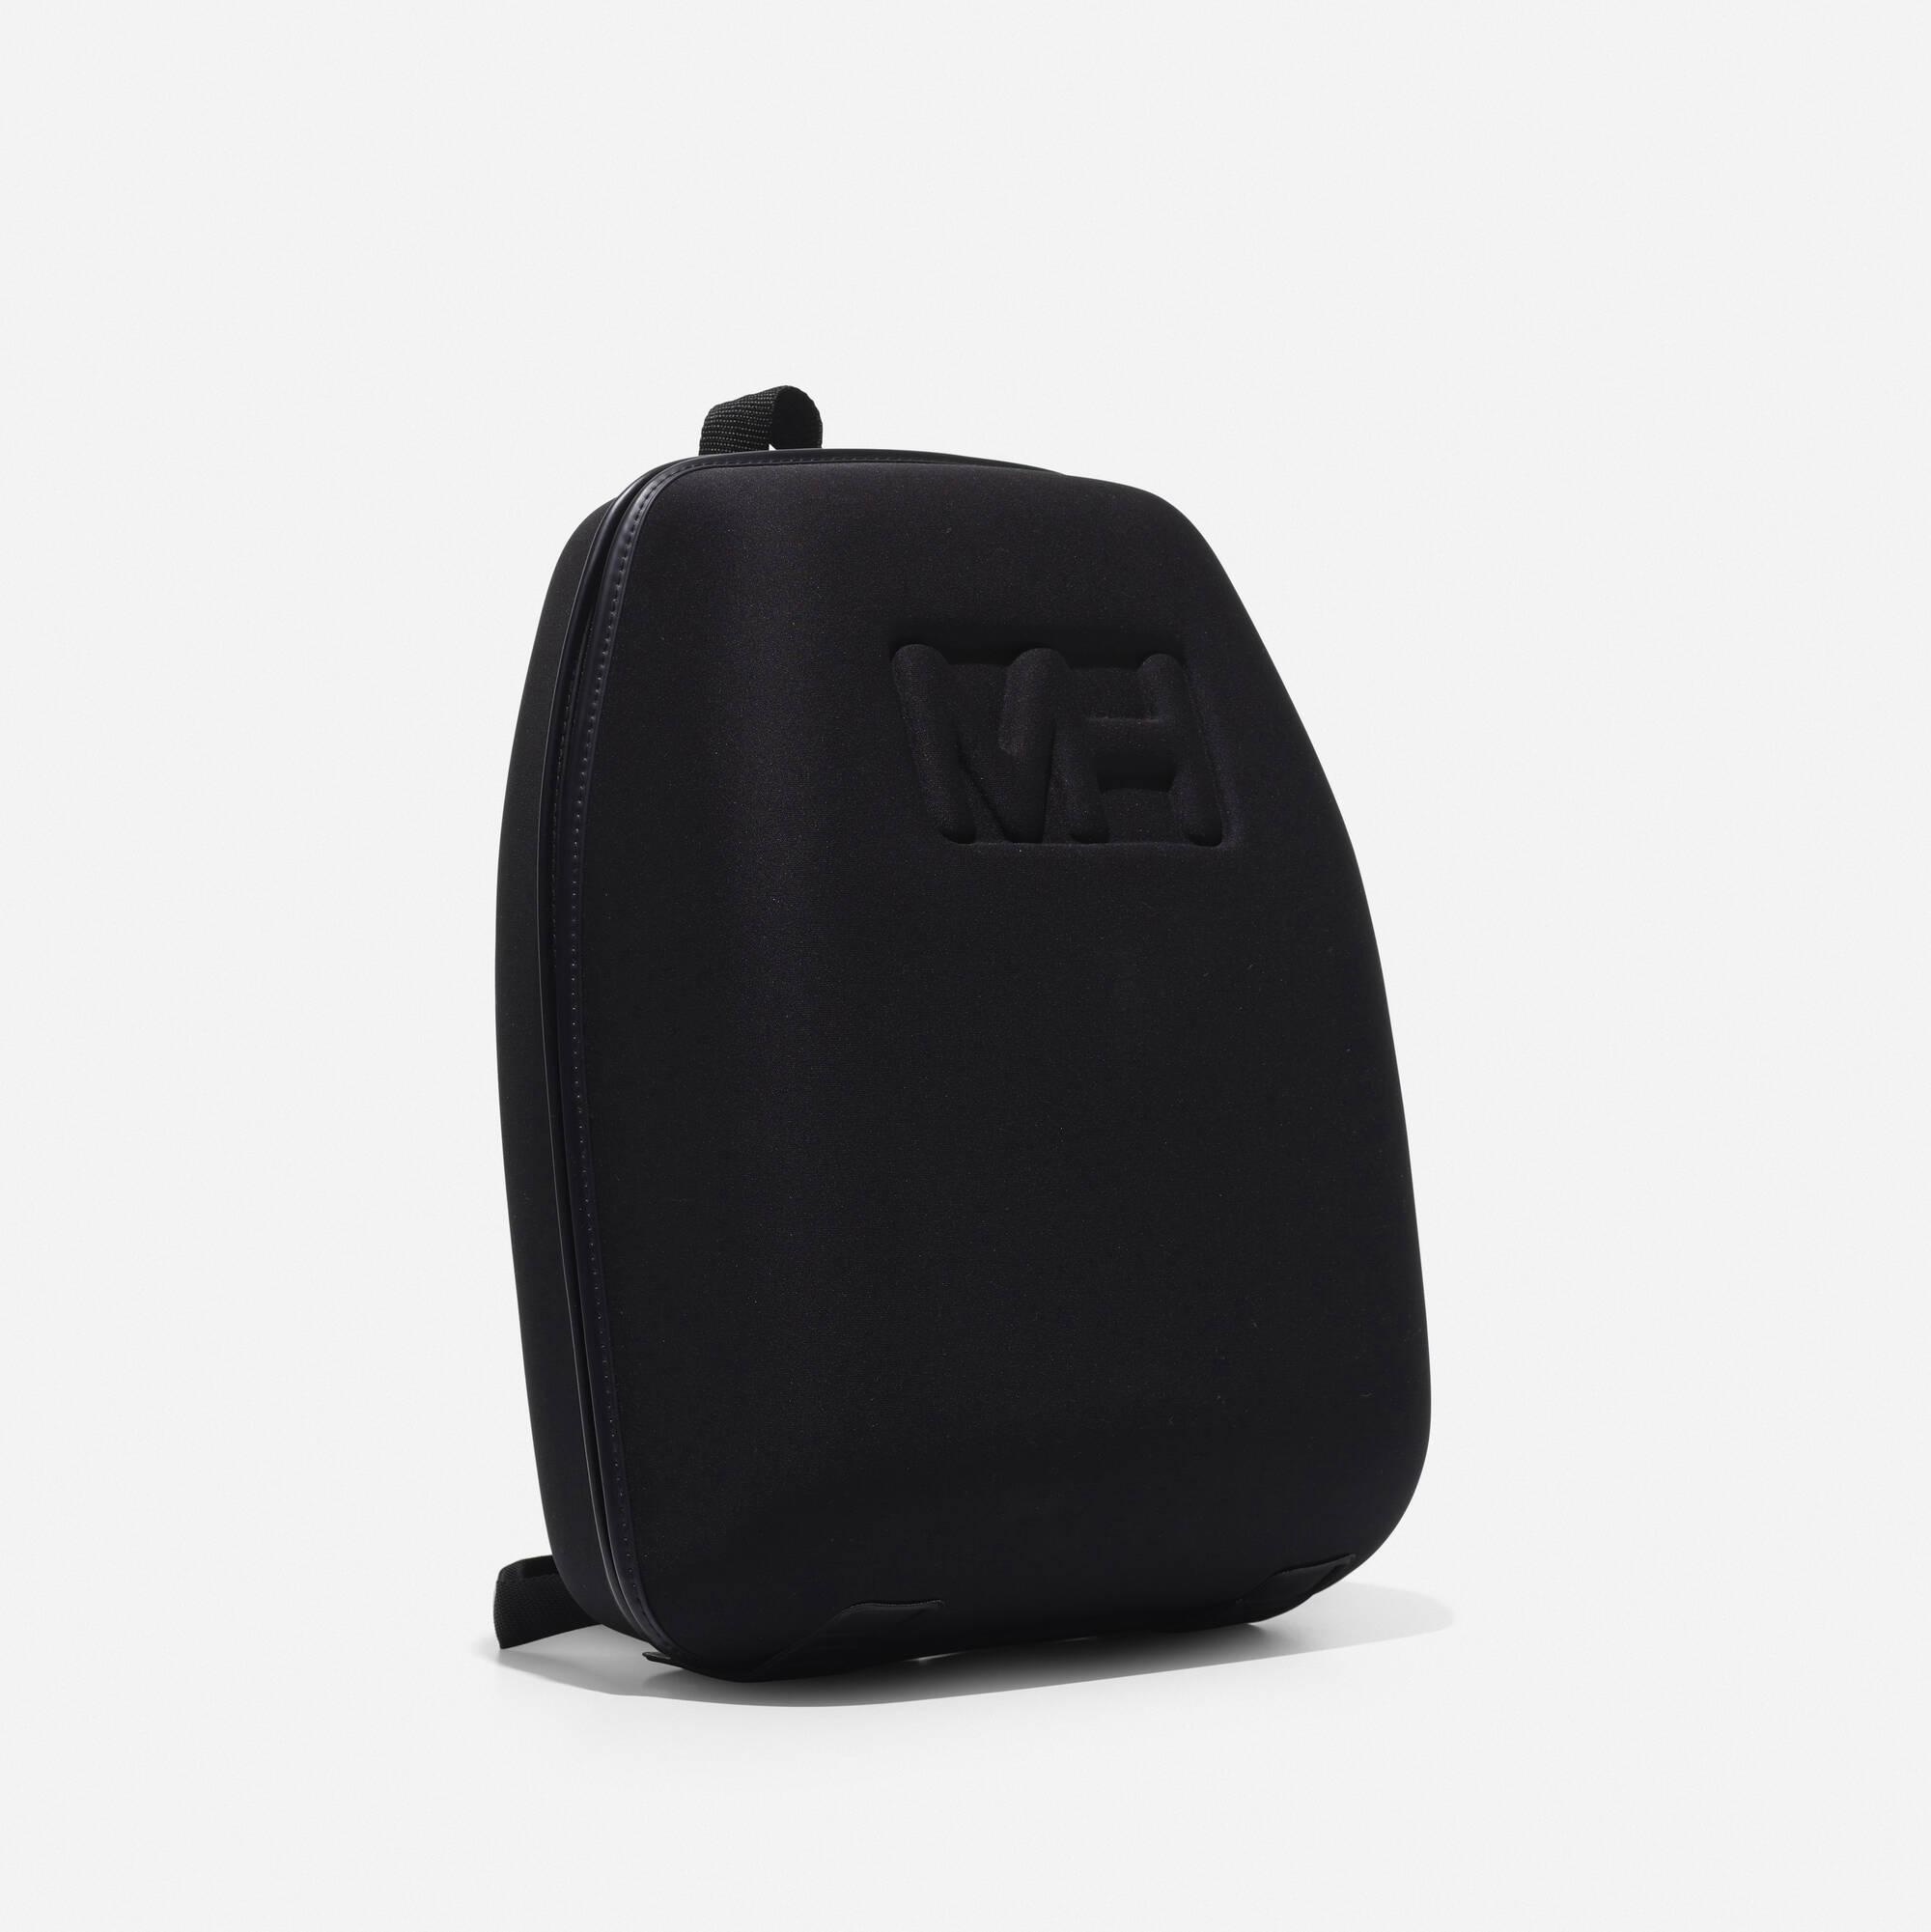 428: Makio Hasuike / Impronta backpack (2 of 2)